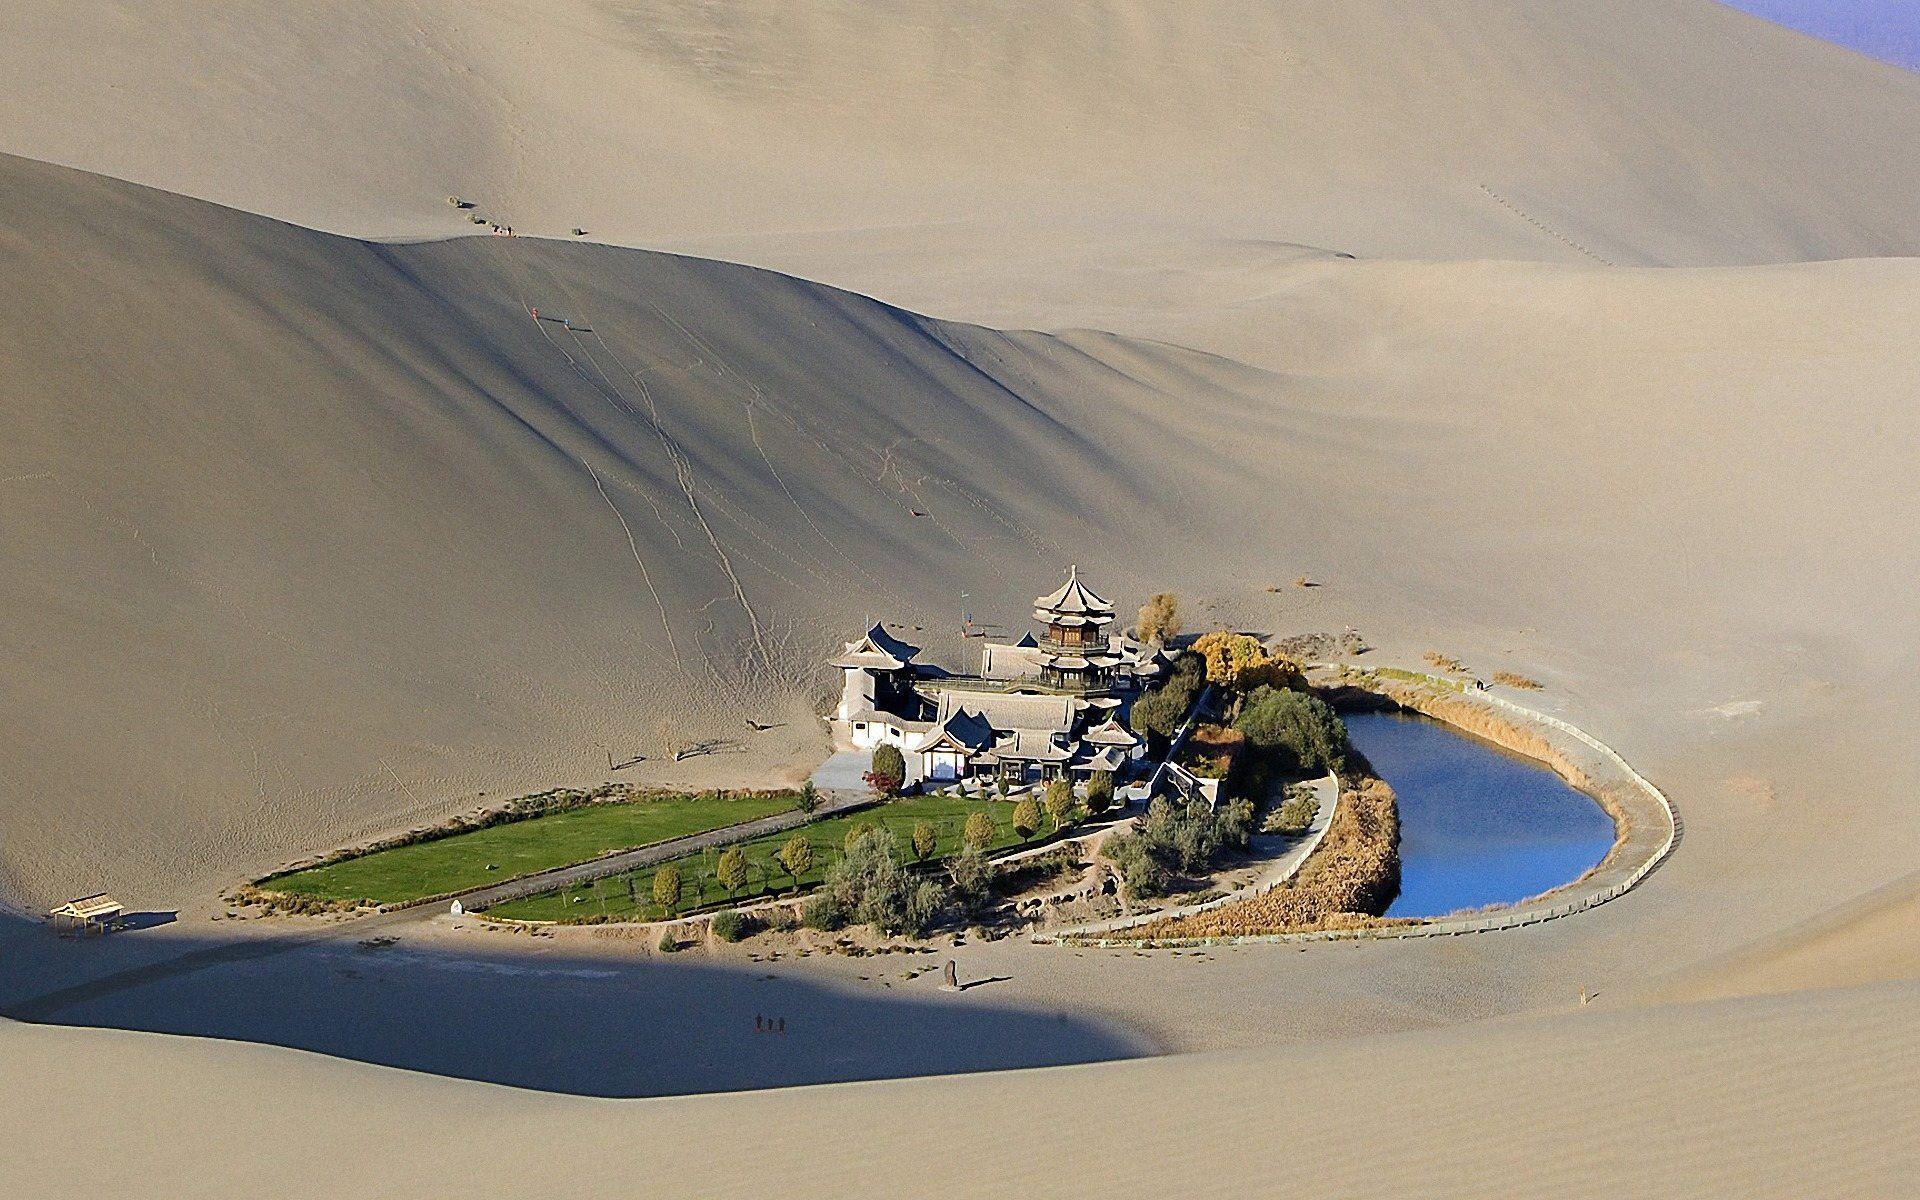 Оазис посреди пустыни